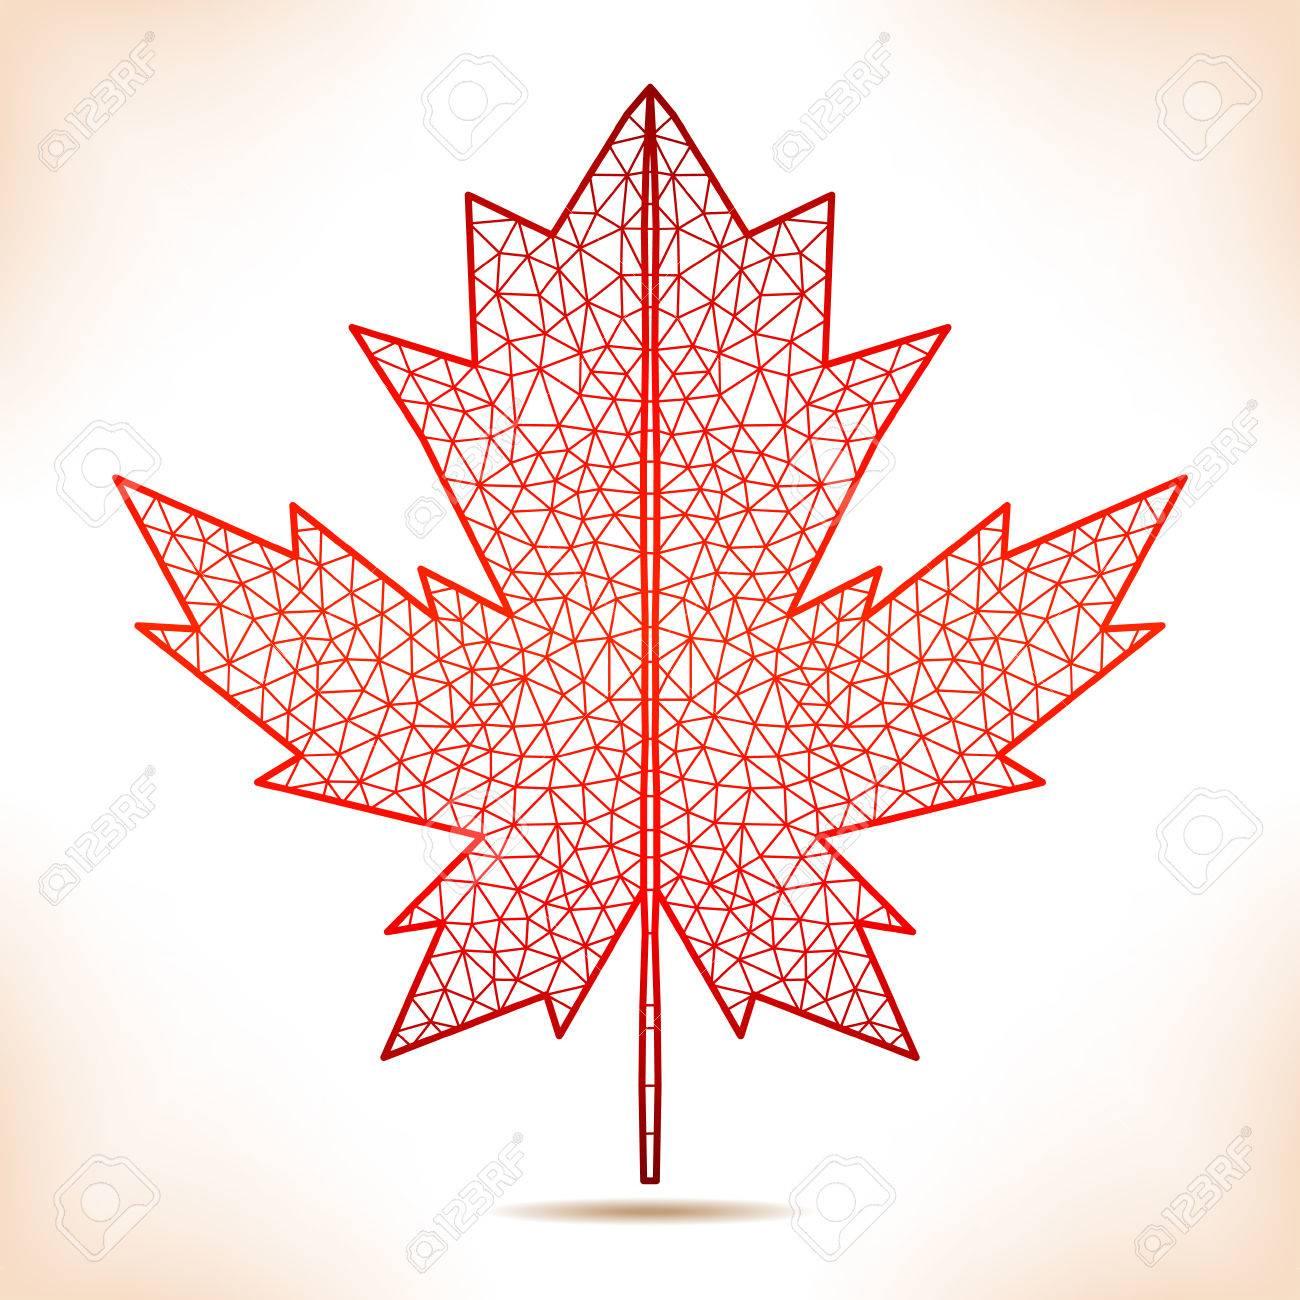 geometric interpretation of the red maple leaf royalty free